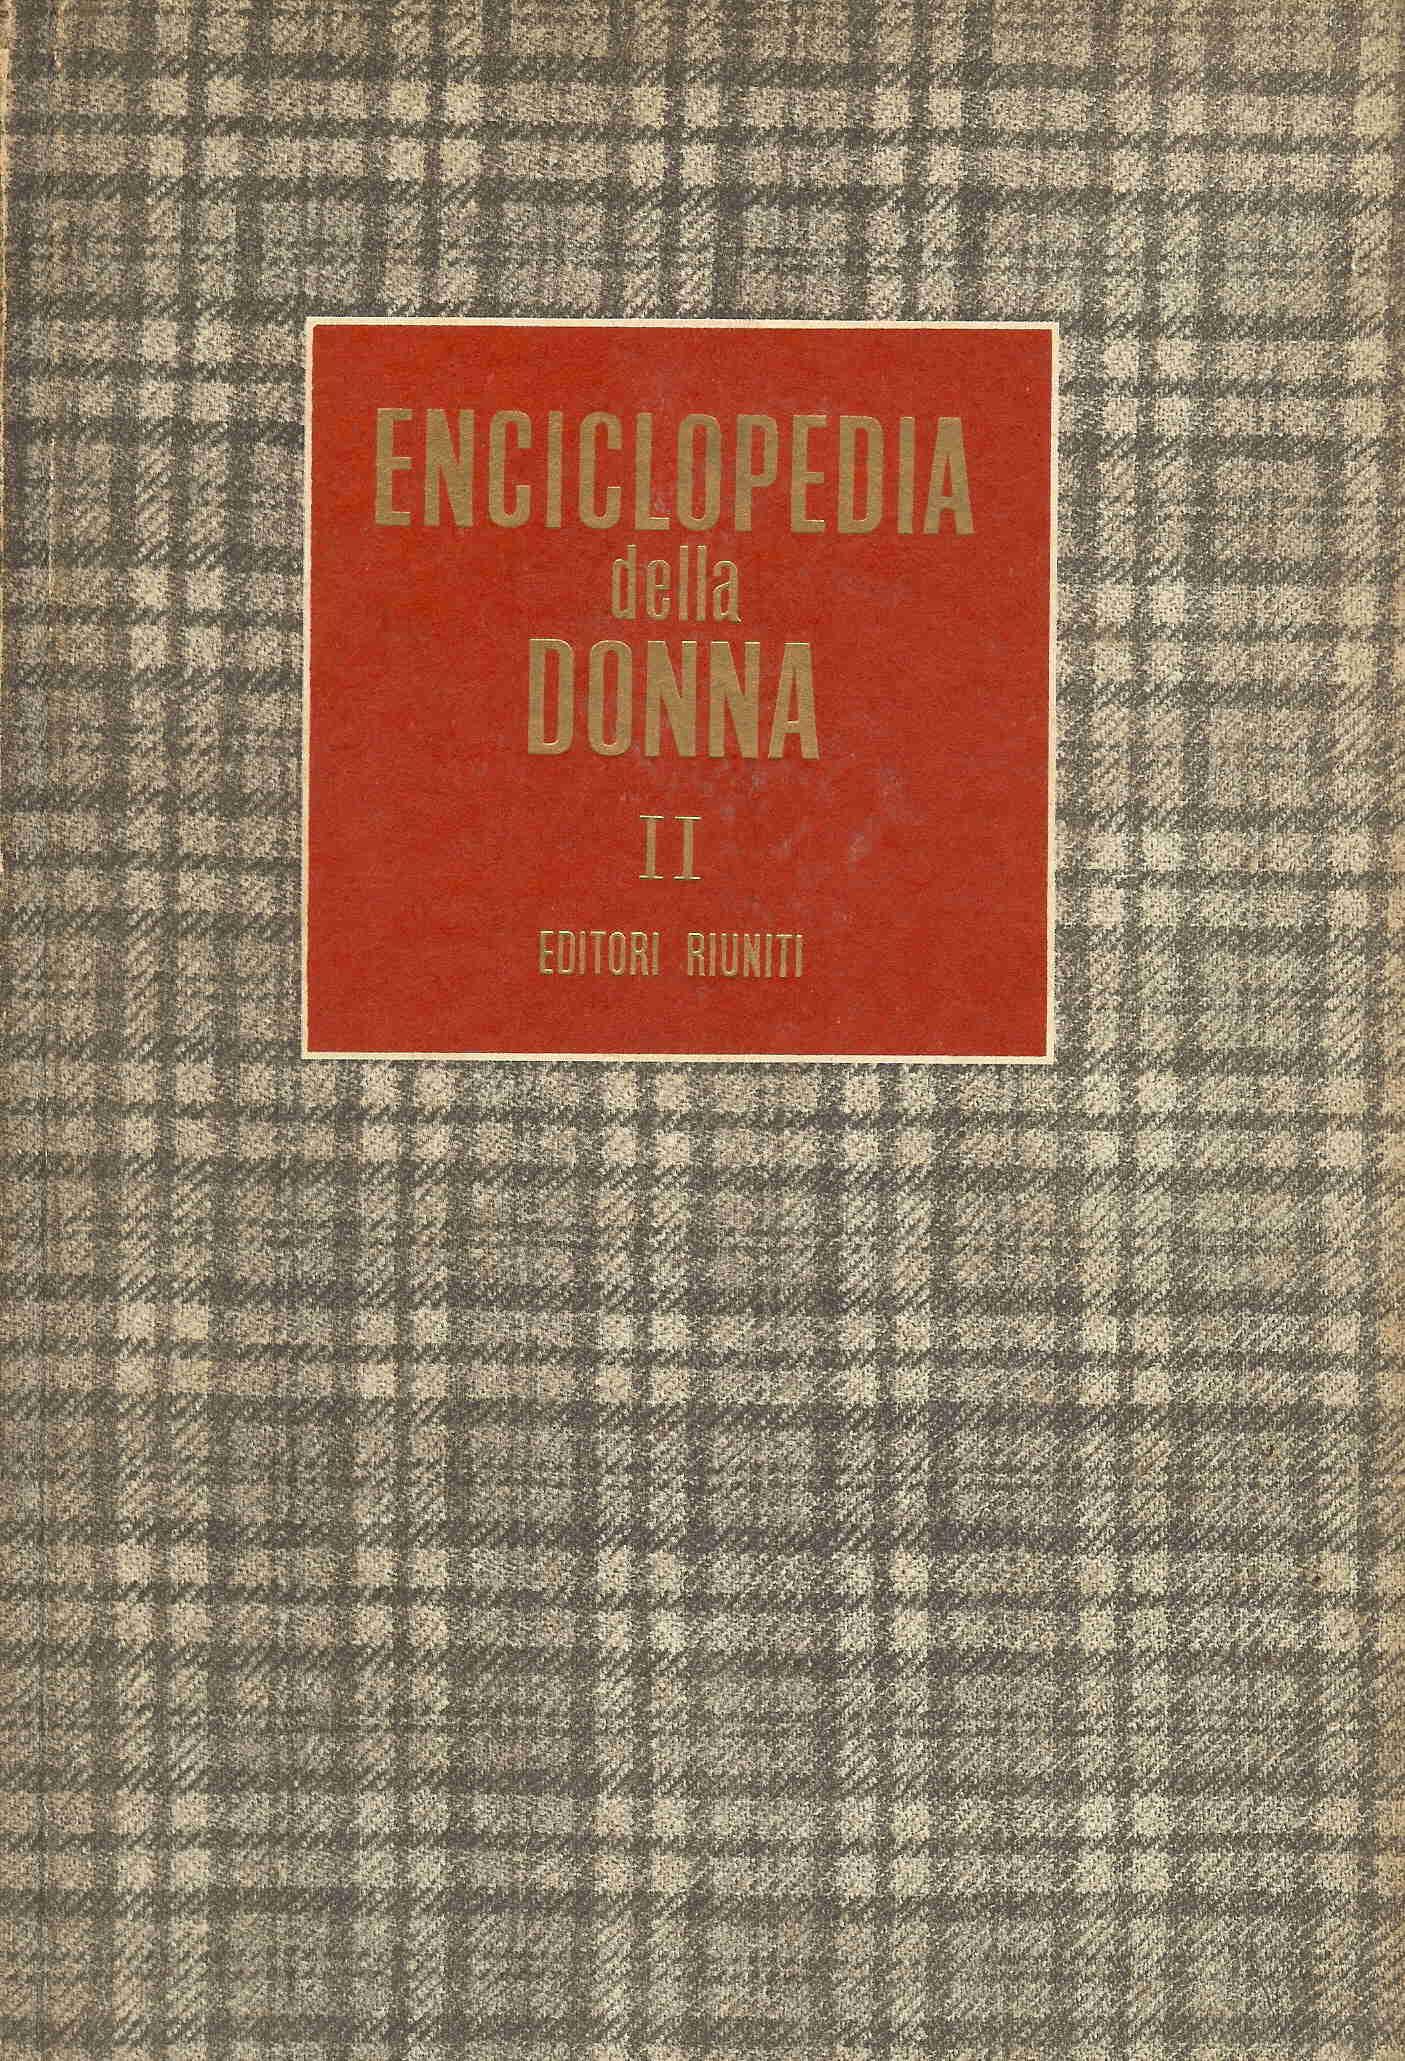 Enciclopedia della donna - Vol. 2